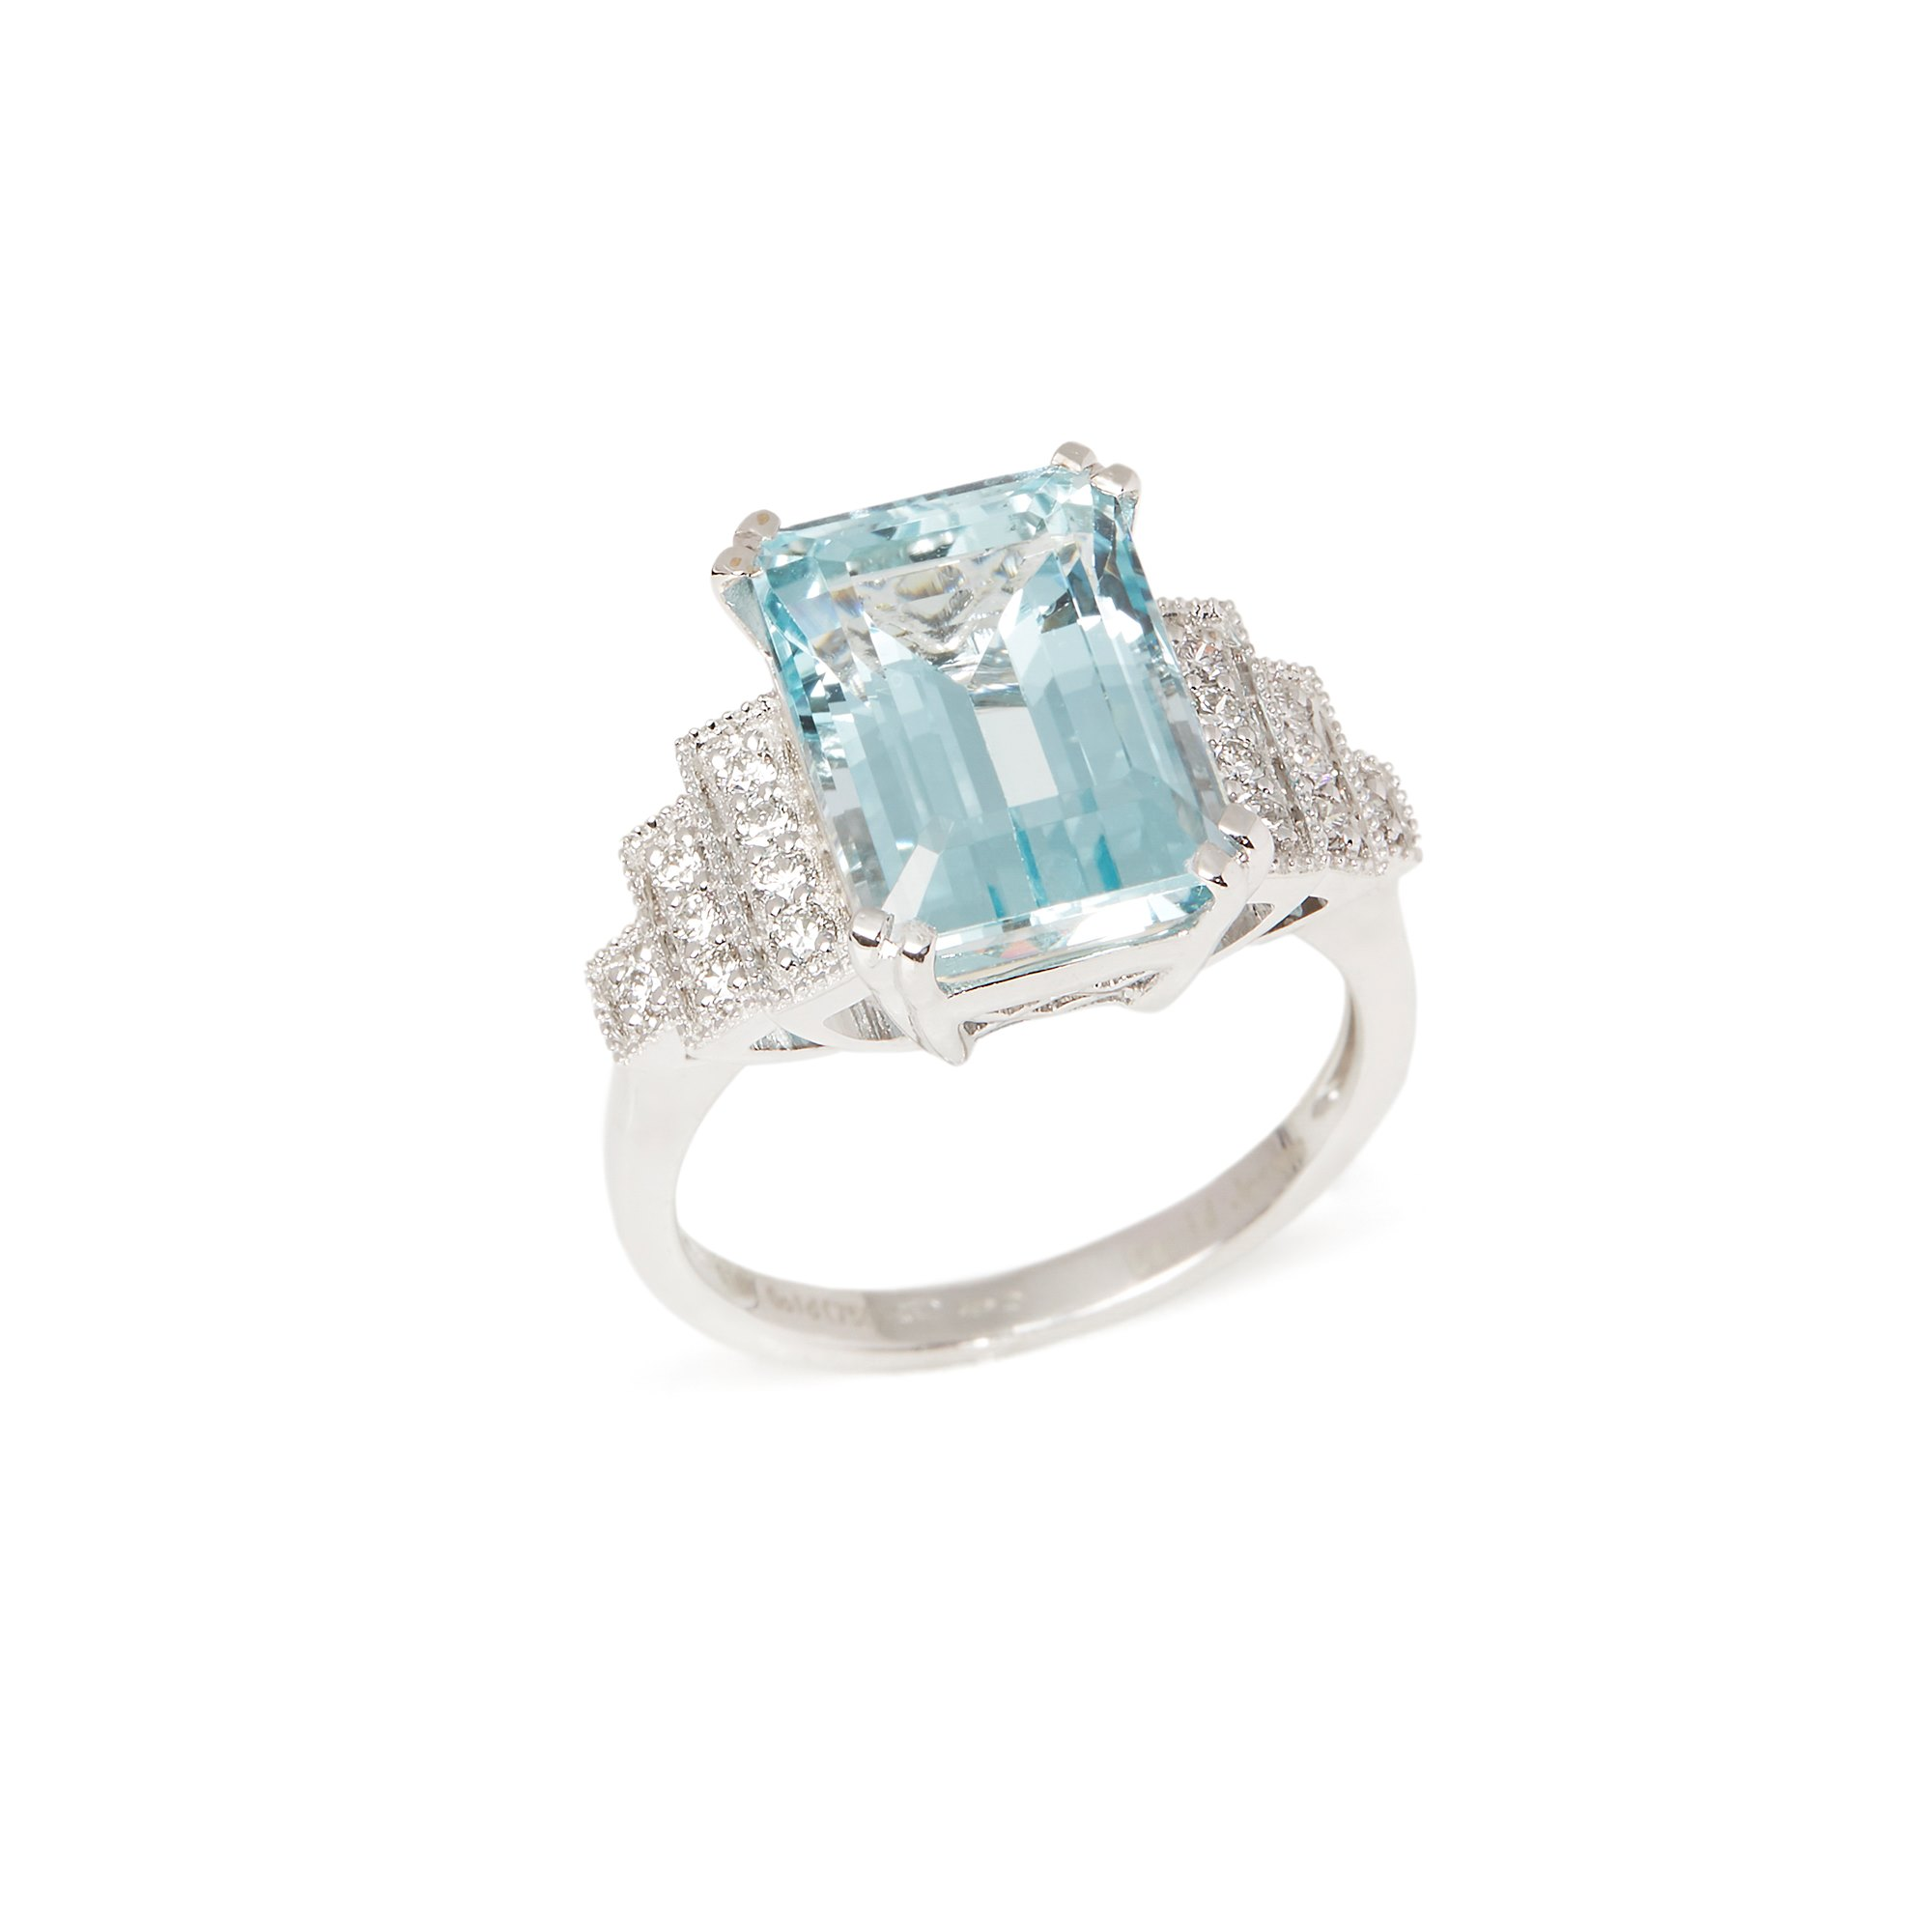 David Jerome 18k White Gold Aquamarine and Diamond Ring